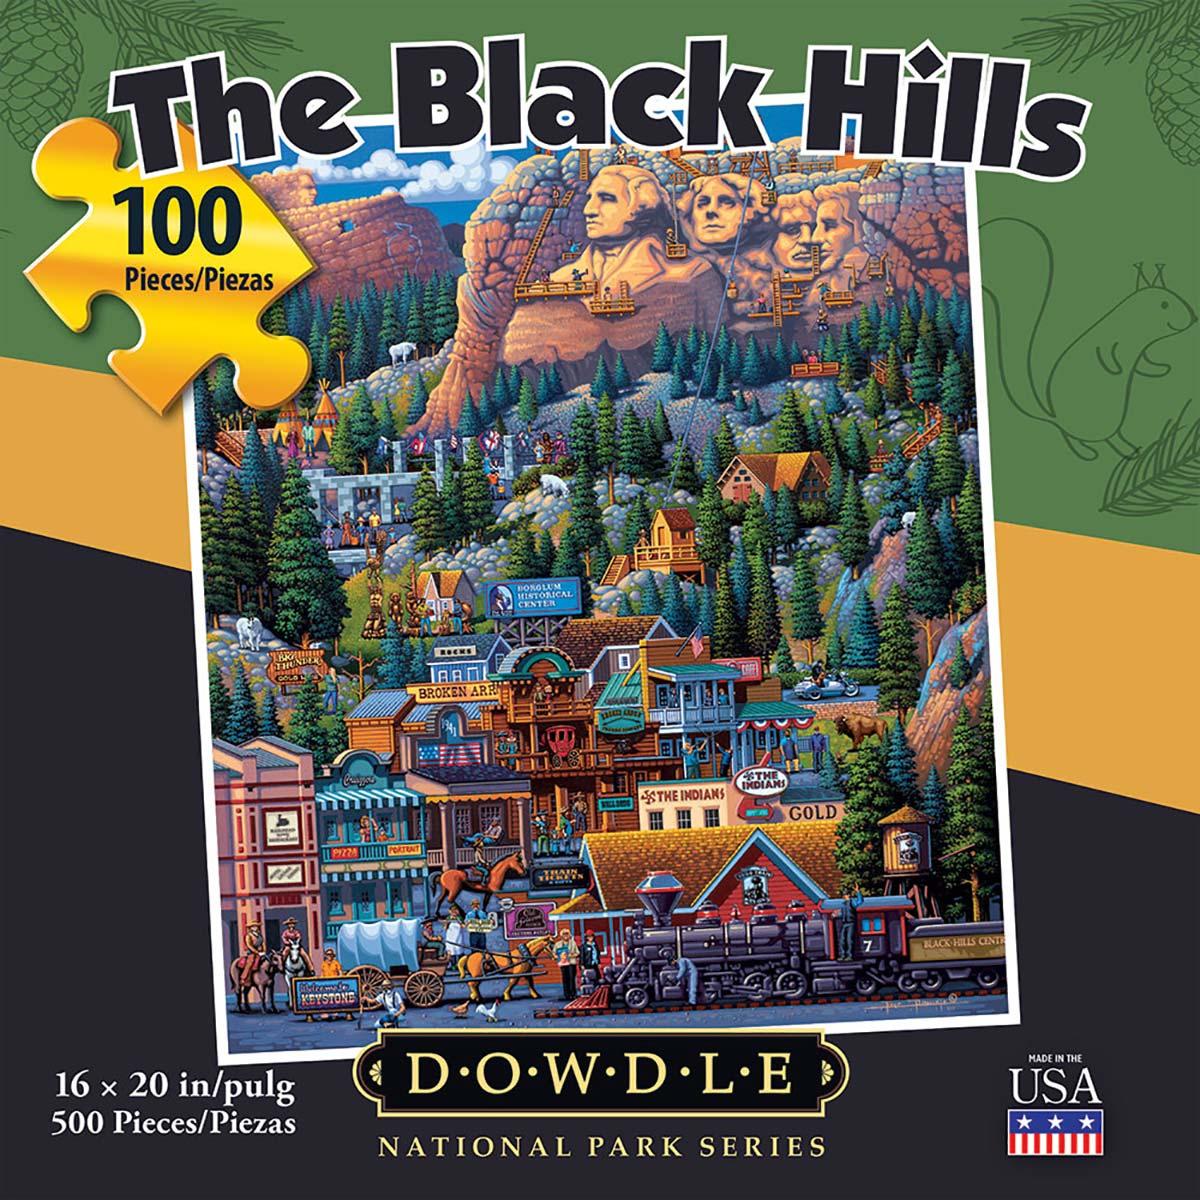 The Black Hills Landmarks / Monuments Jigsaw Puzzle